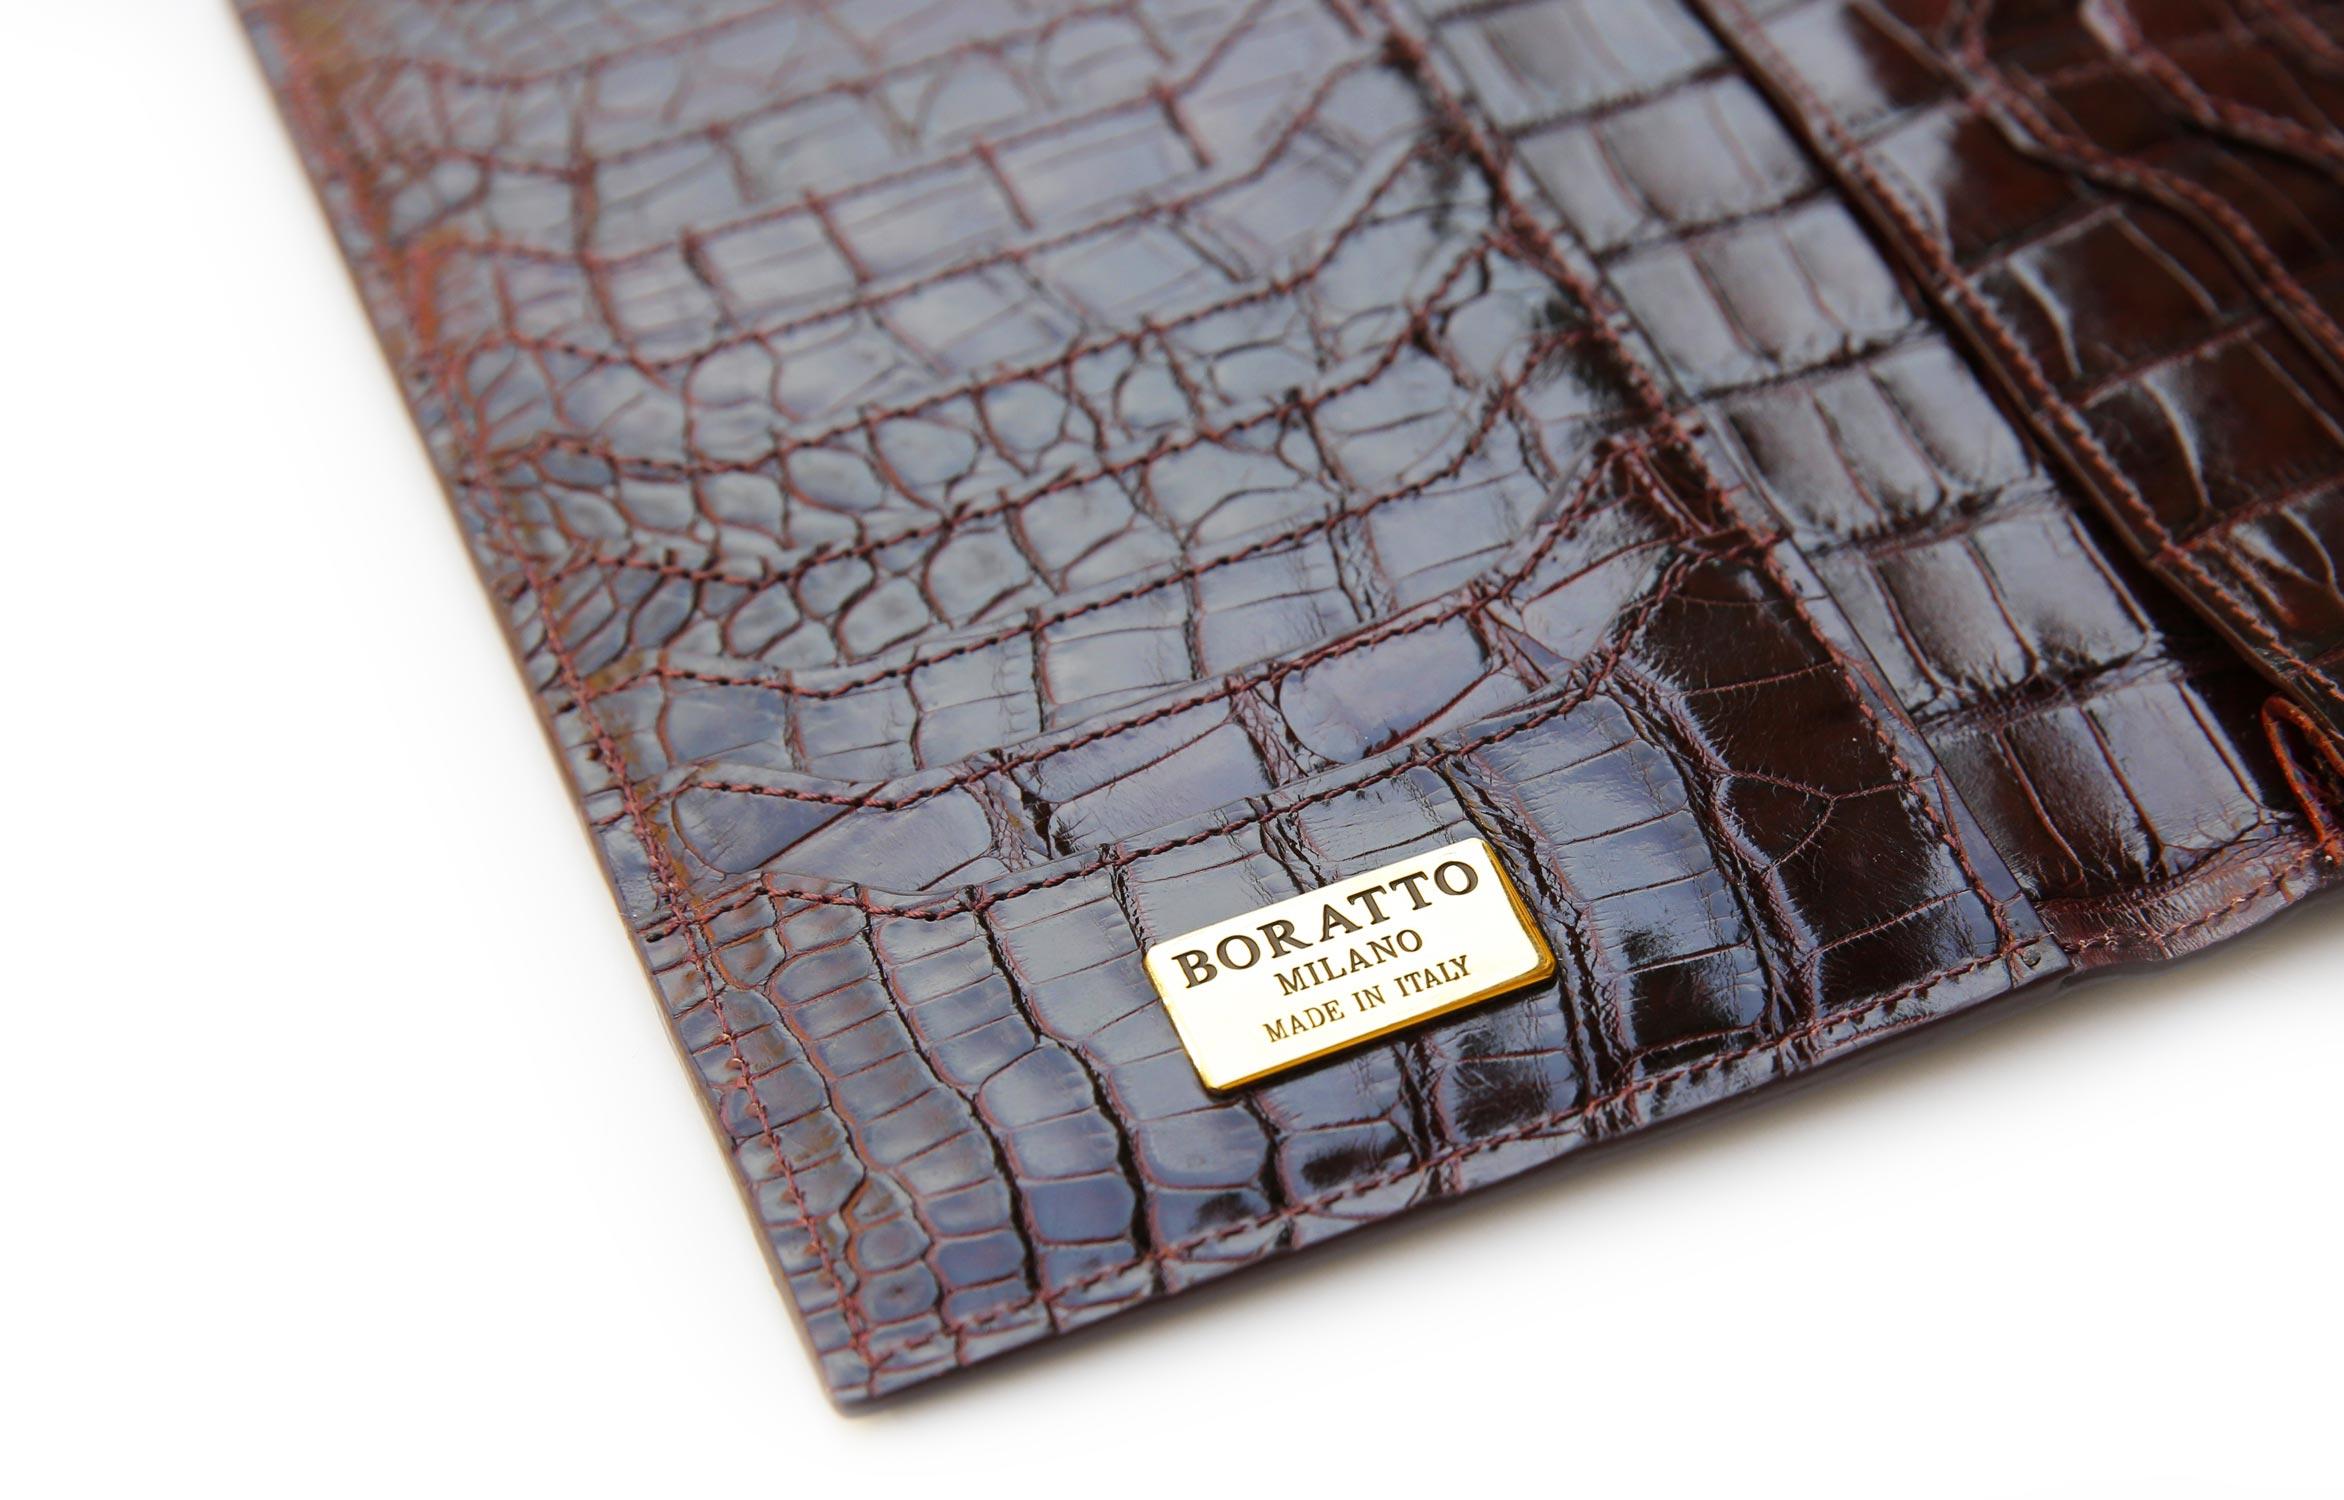 Craftsmanship - Boratto Milano